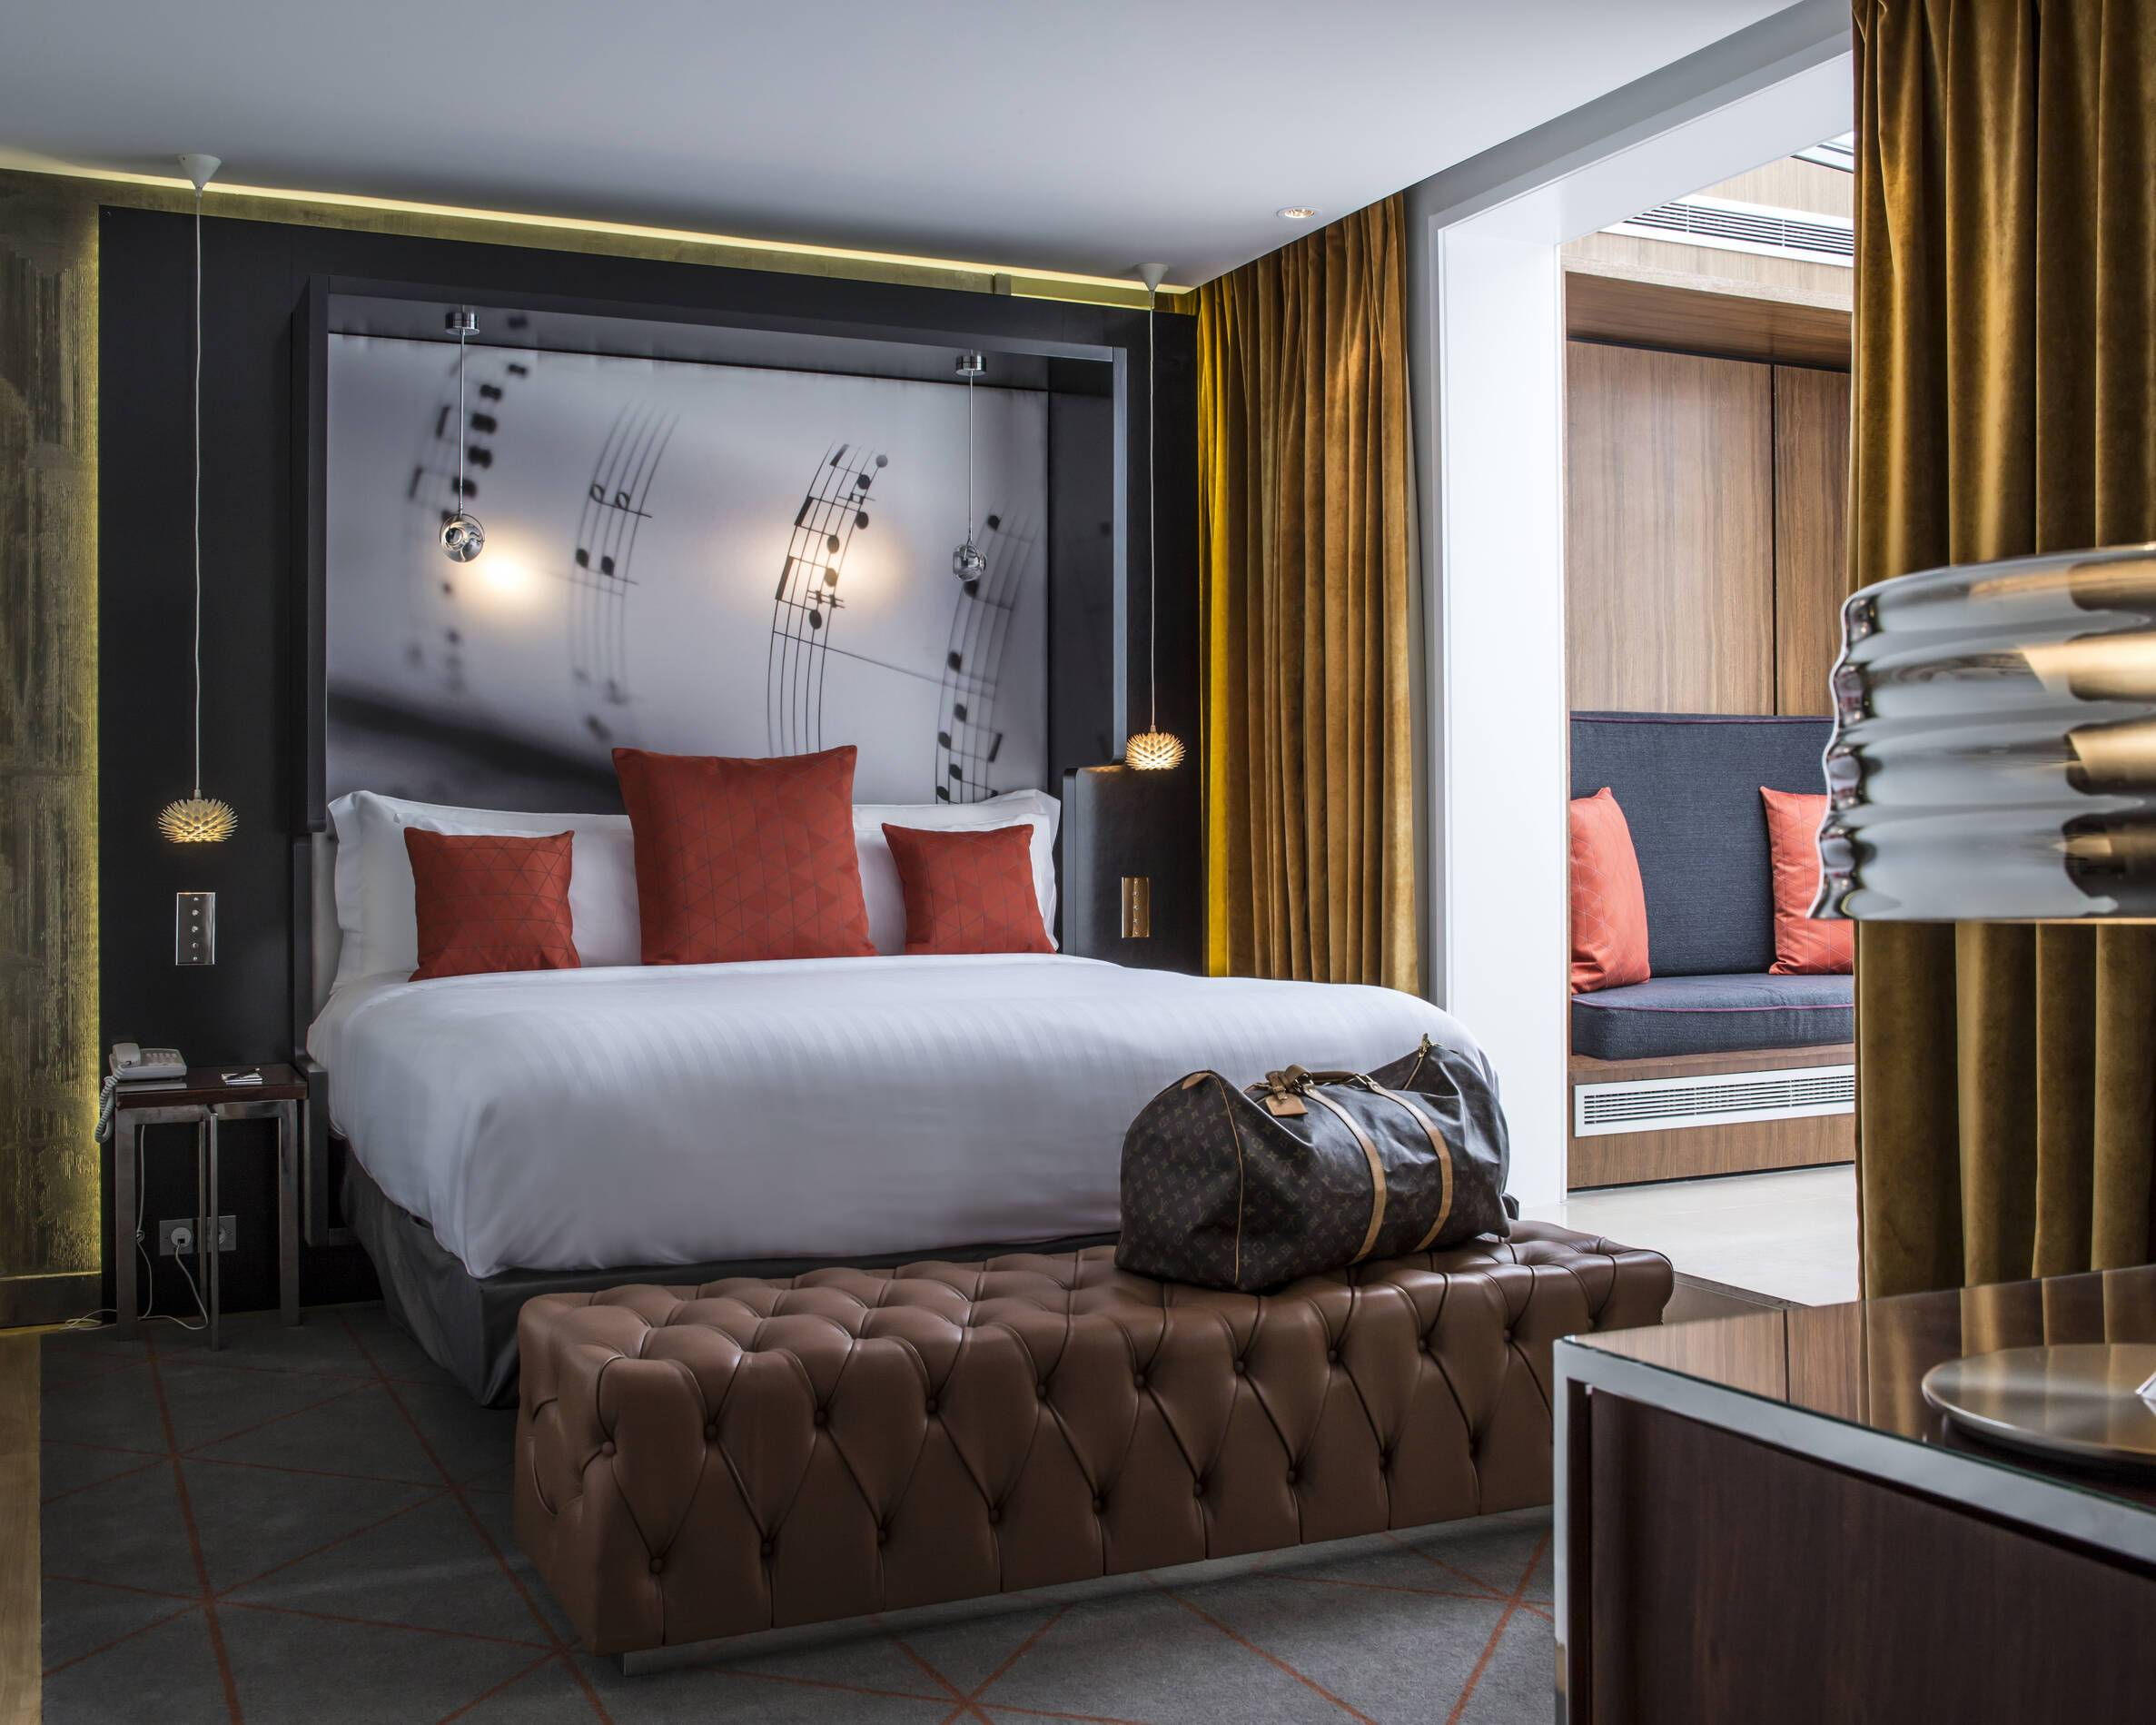 Hotel Sers chambre paris